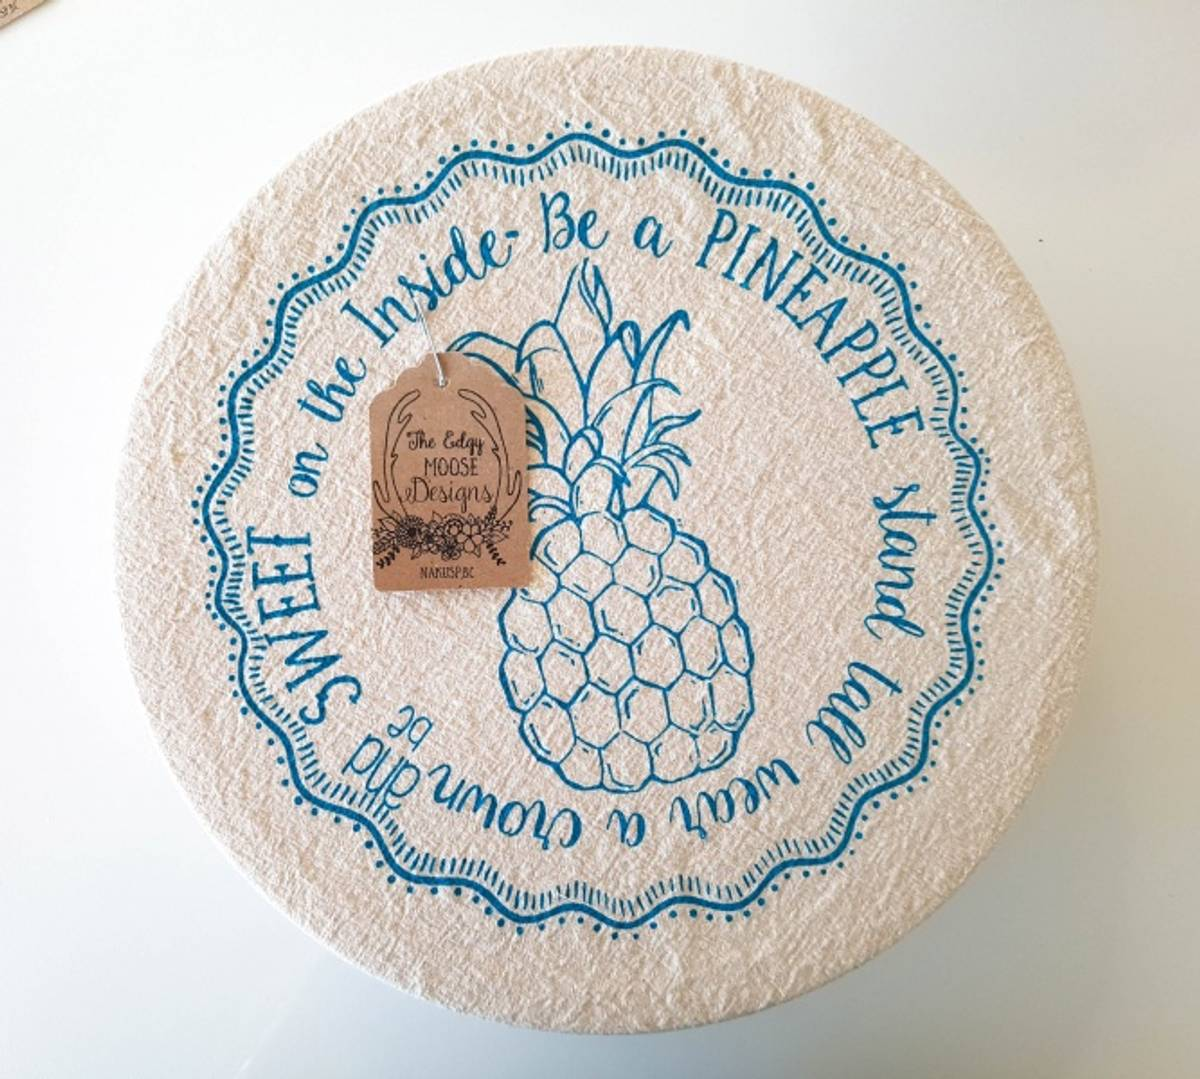 Bolletrekk str. M // Pineapple